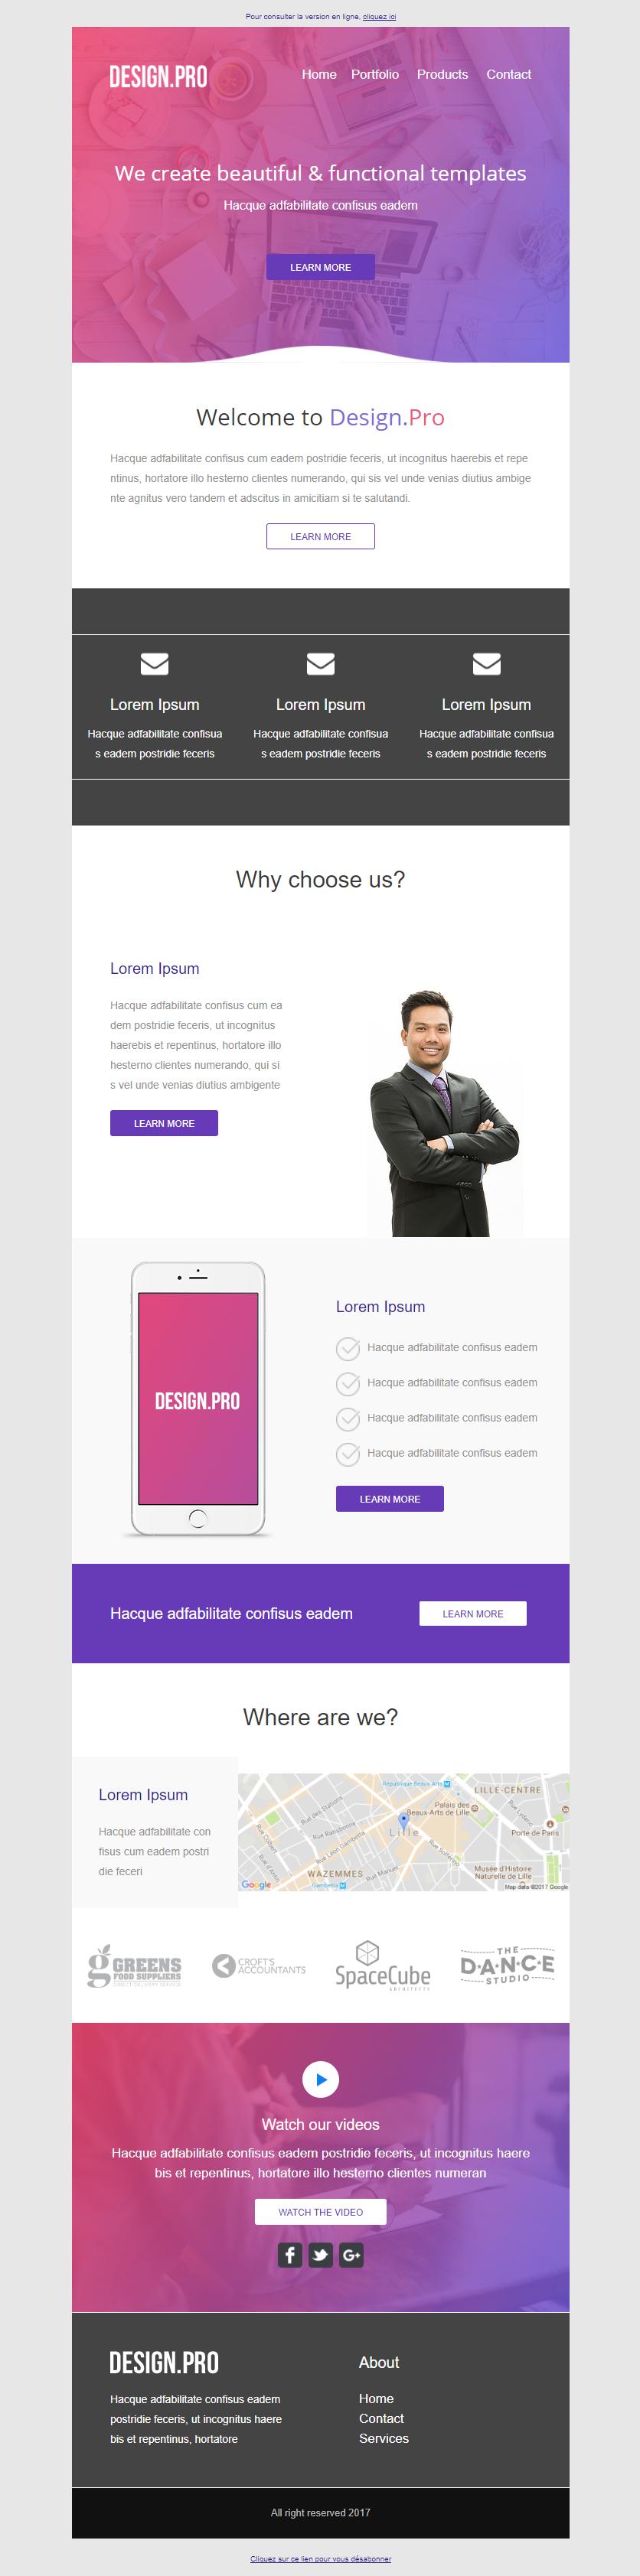 Templates Emailing Designpro Sarbacane